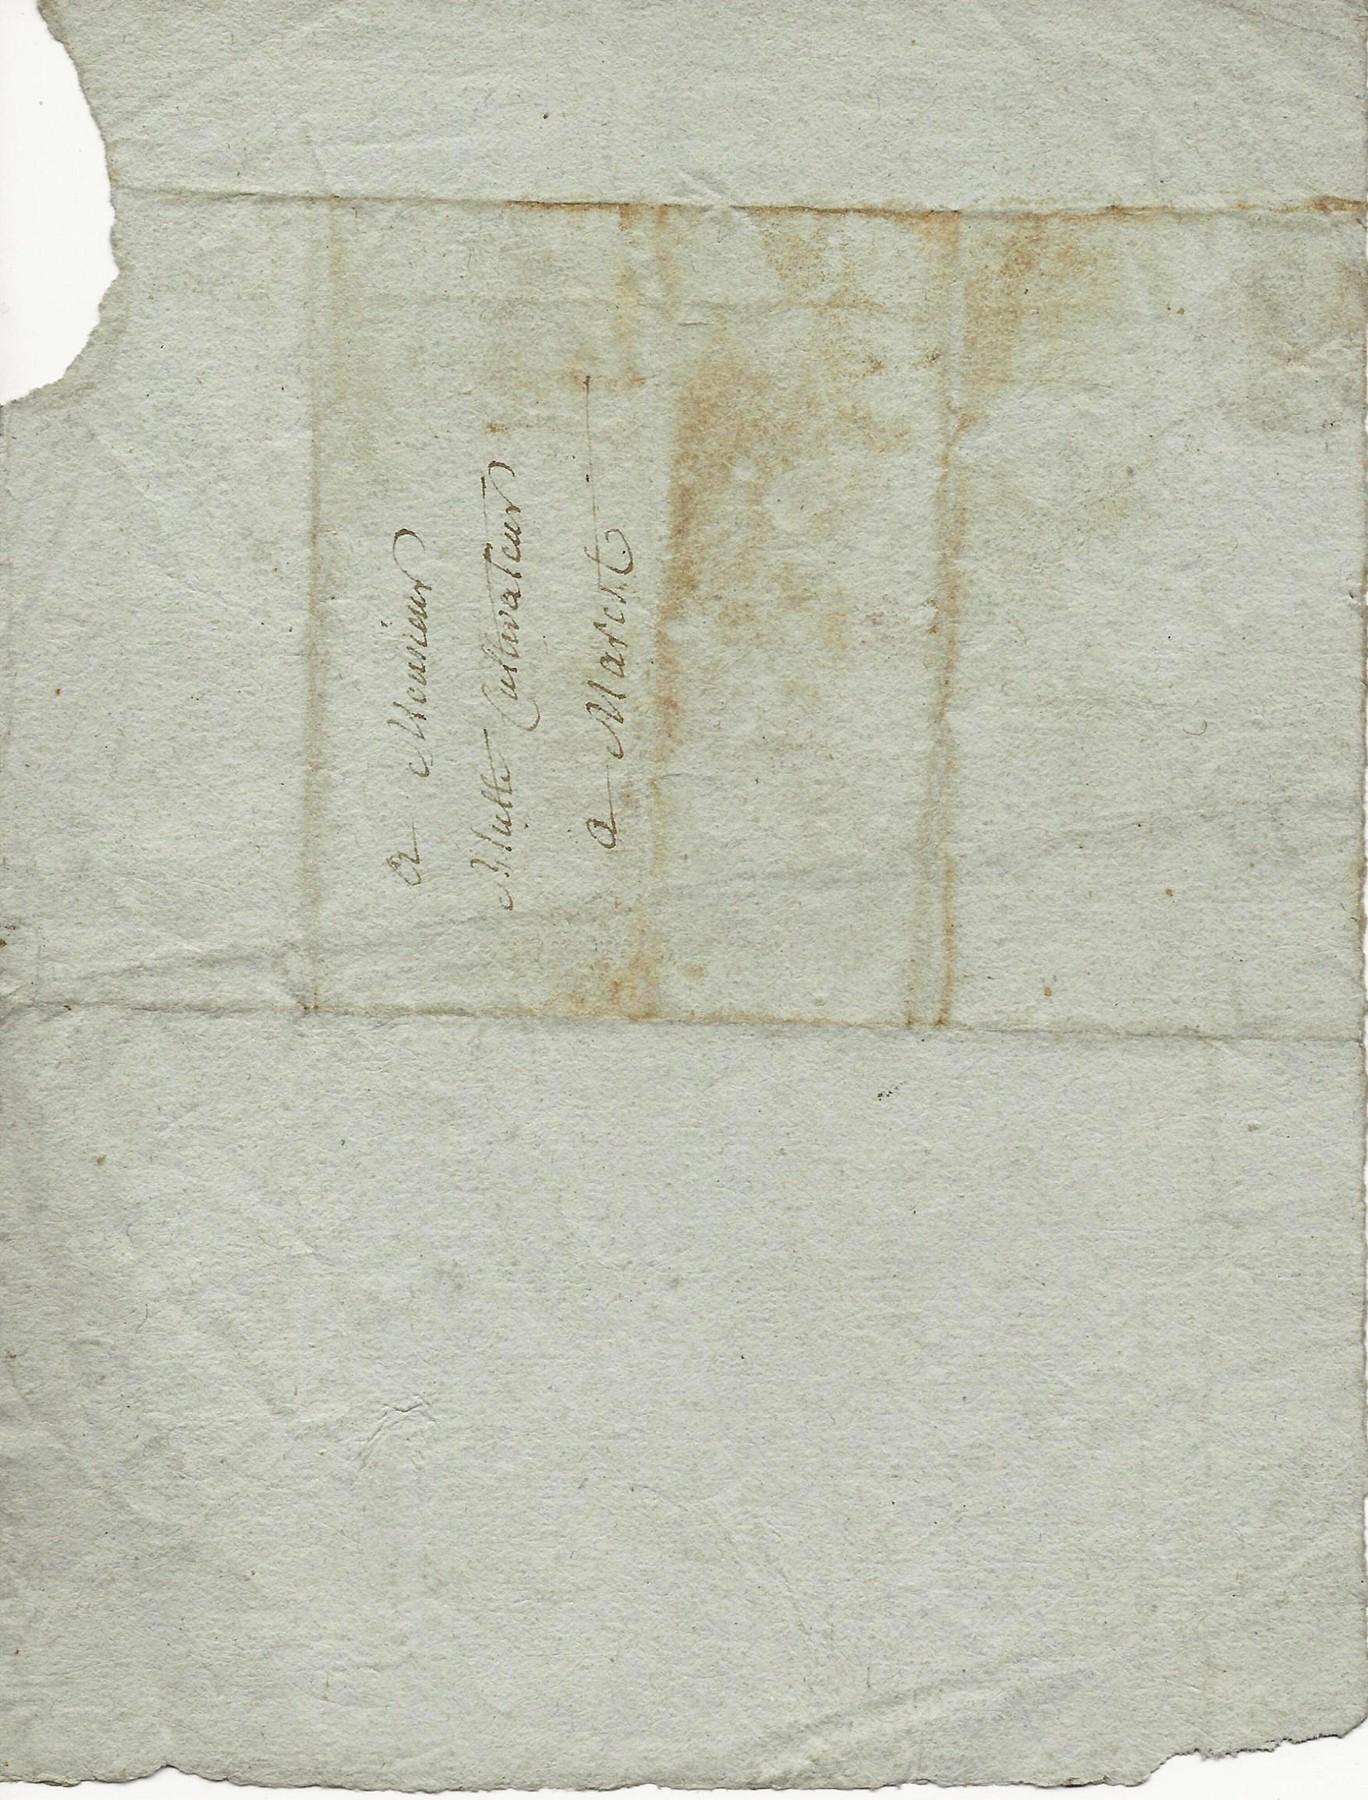 1819 lettre a mr blutte maretz 002